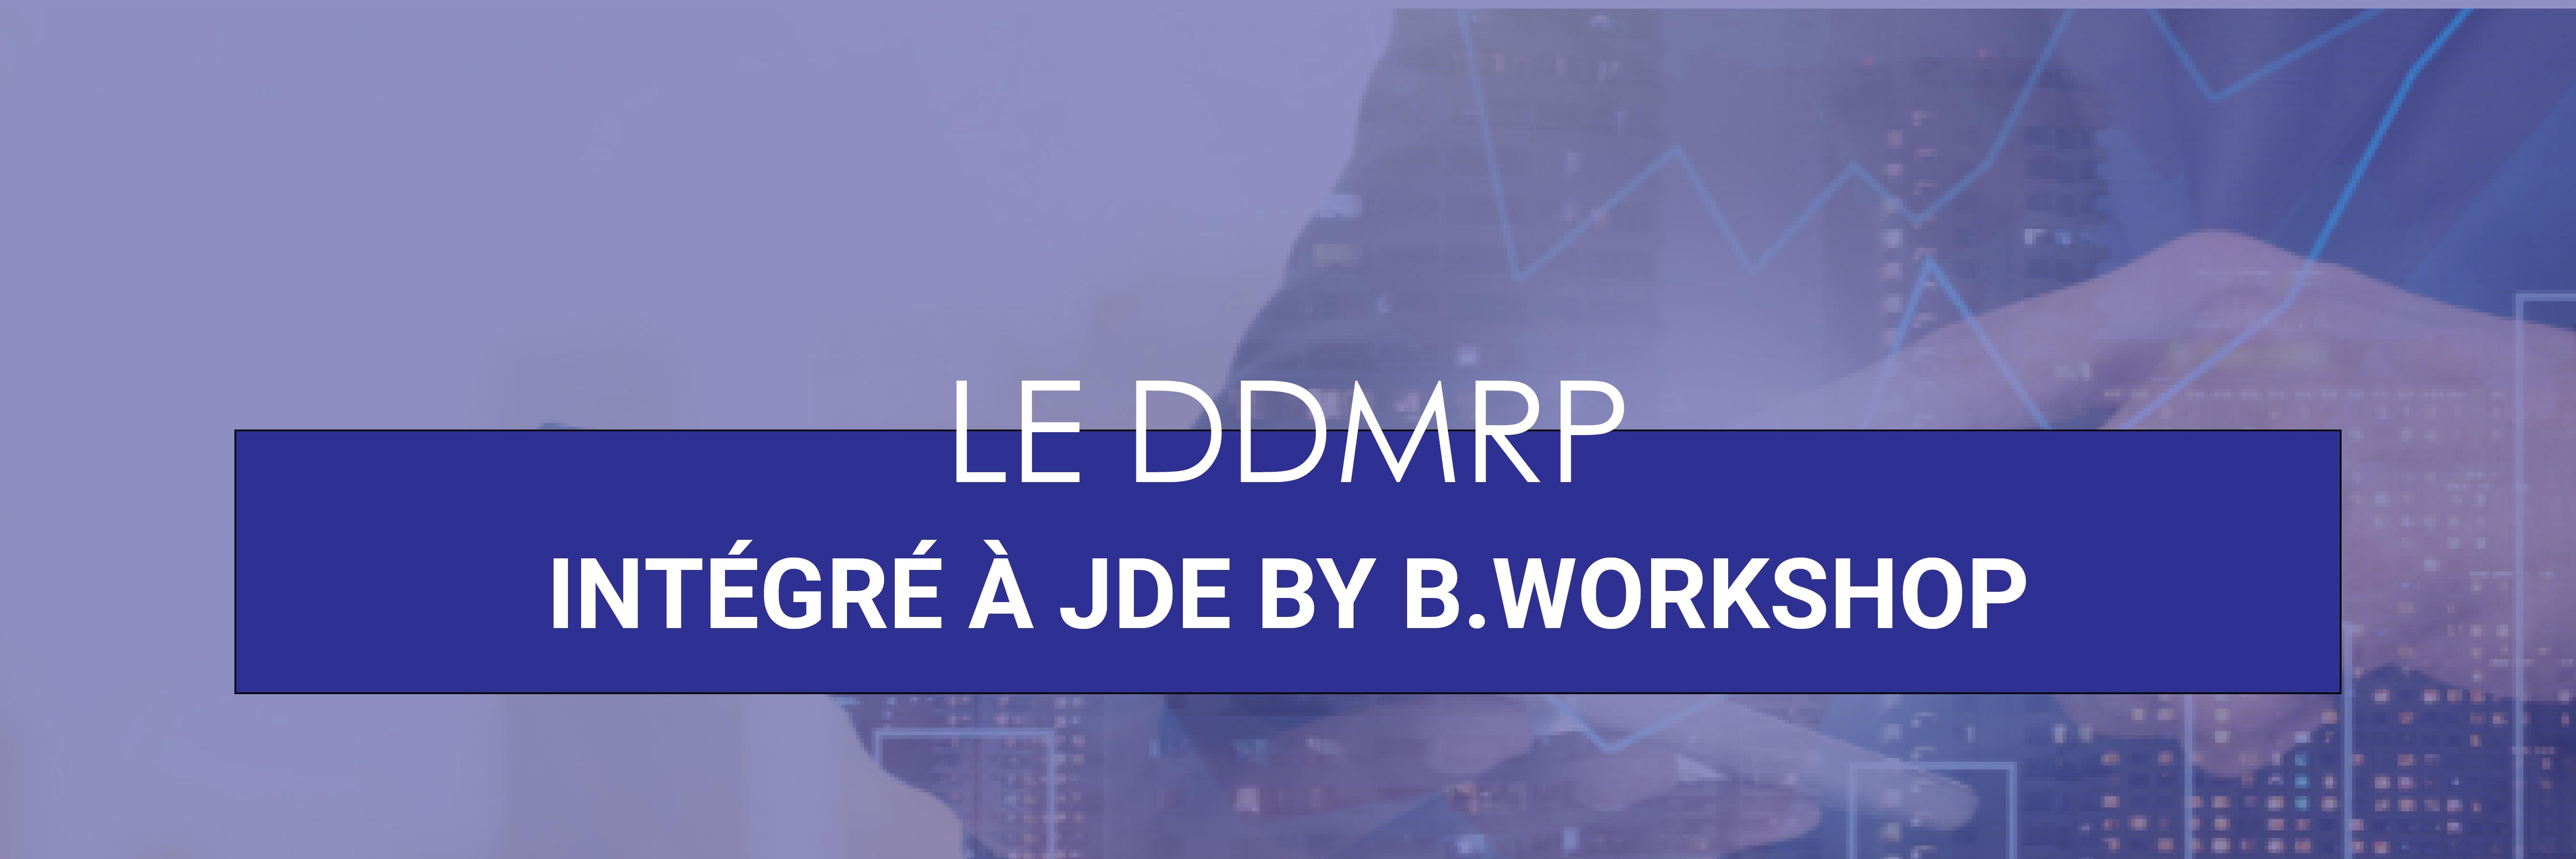 Webinar DDMRP by b.workshop